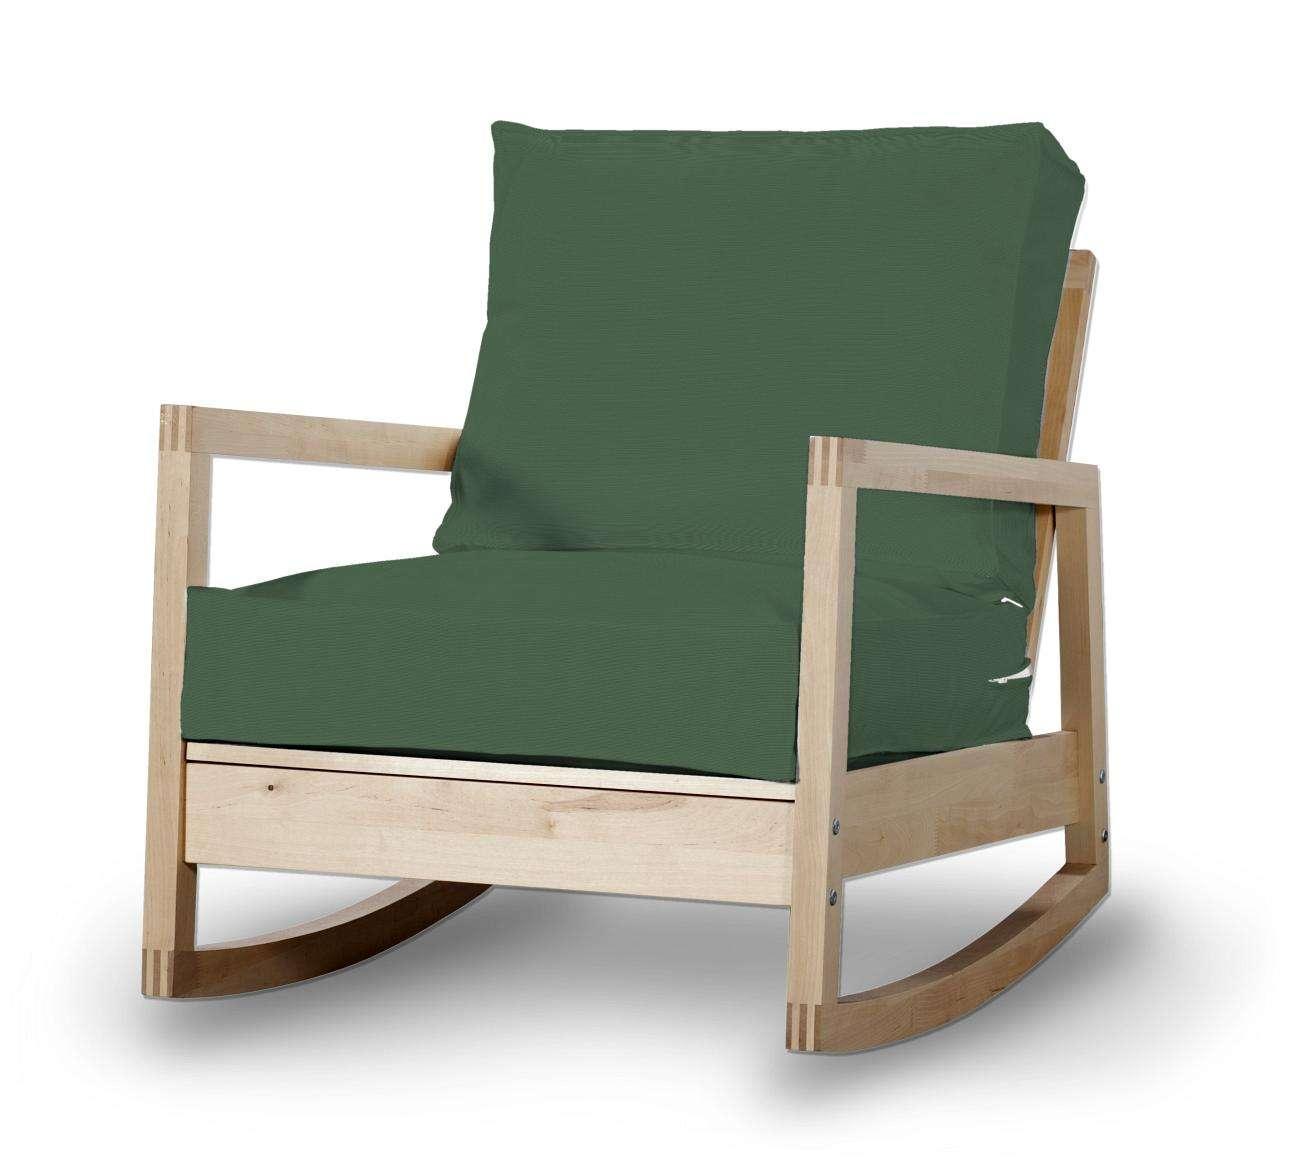 Lillberg Sesselbezug Sesselhusse, Modell Lillberg von der Kollektion Cotton Panama, Stoff: 702-06